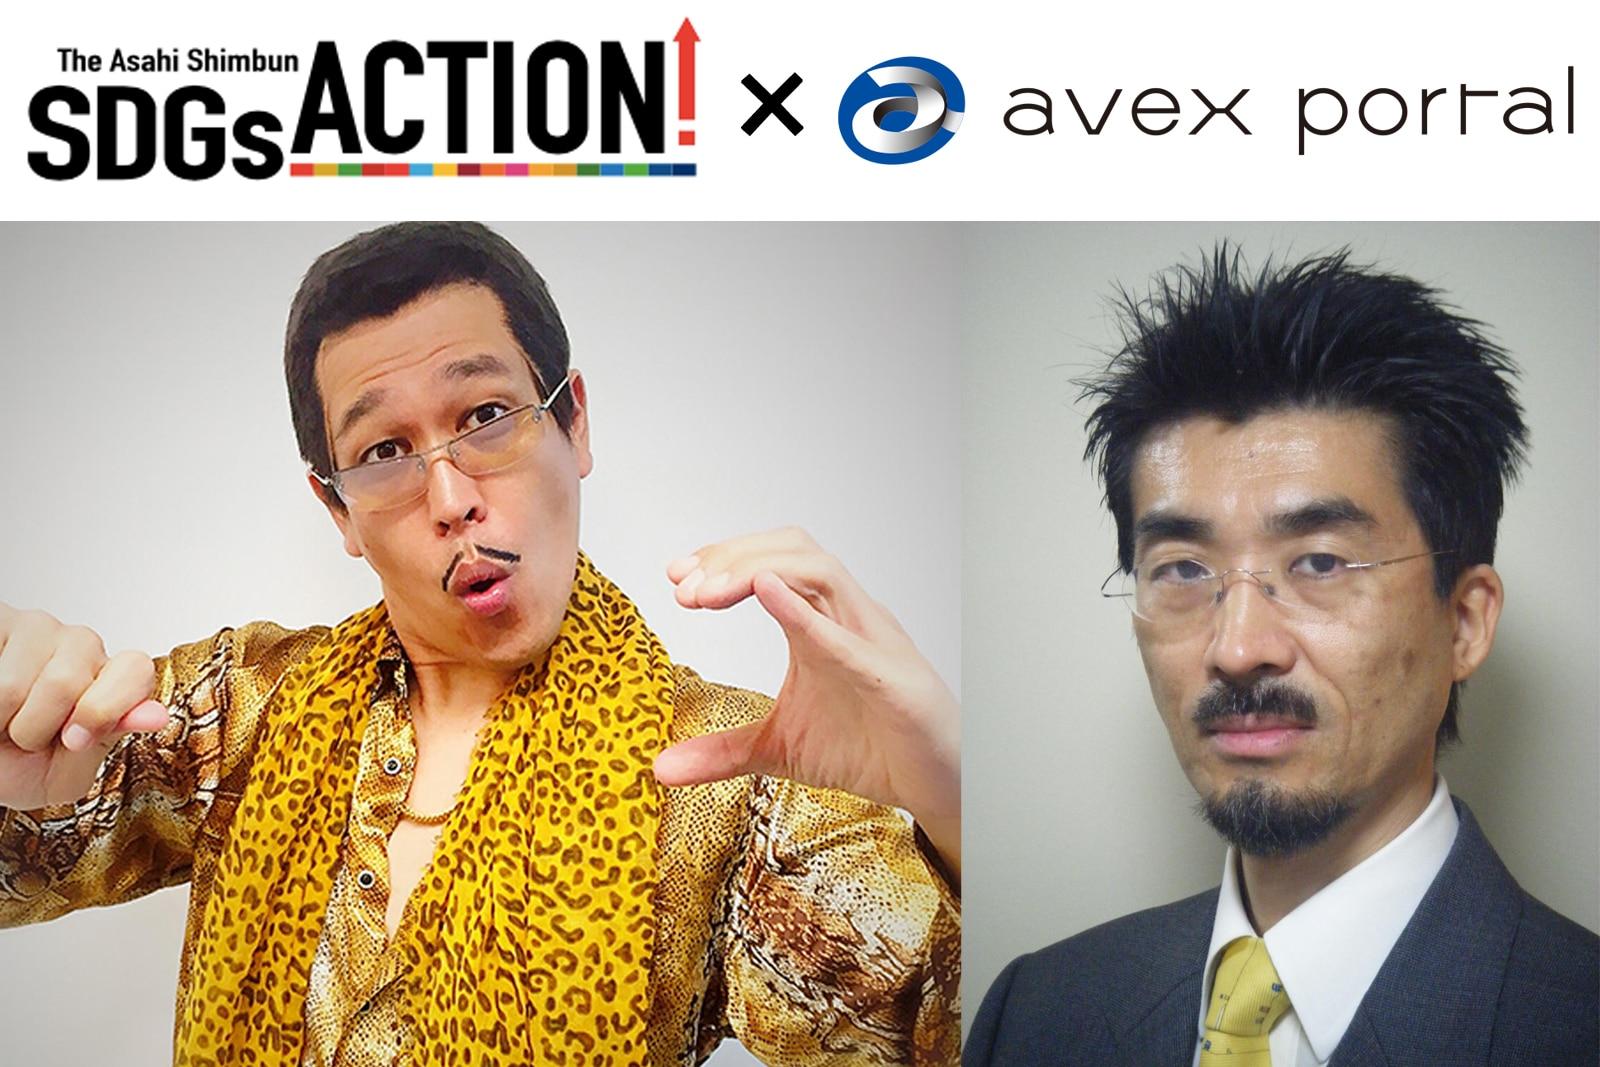 ピコ太郎、安田陽先生